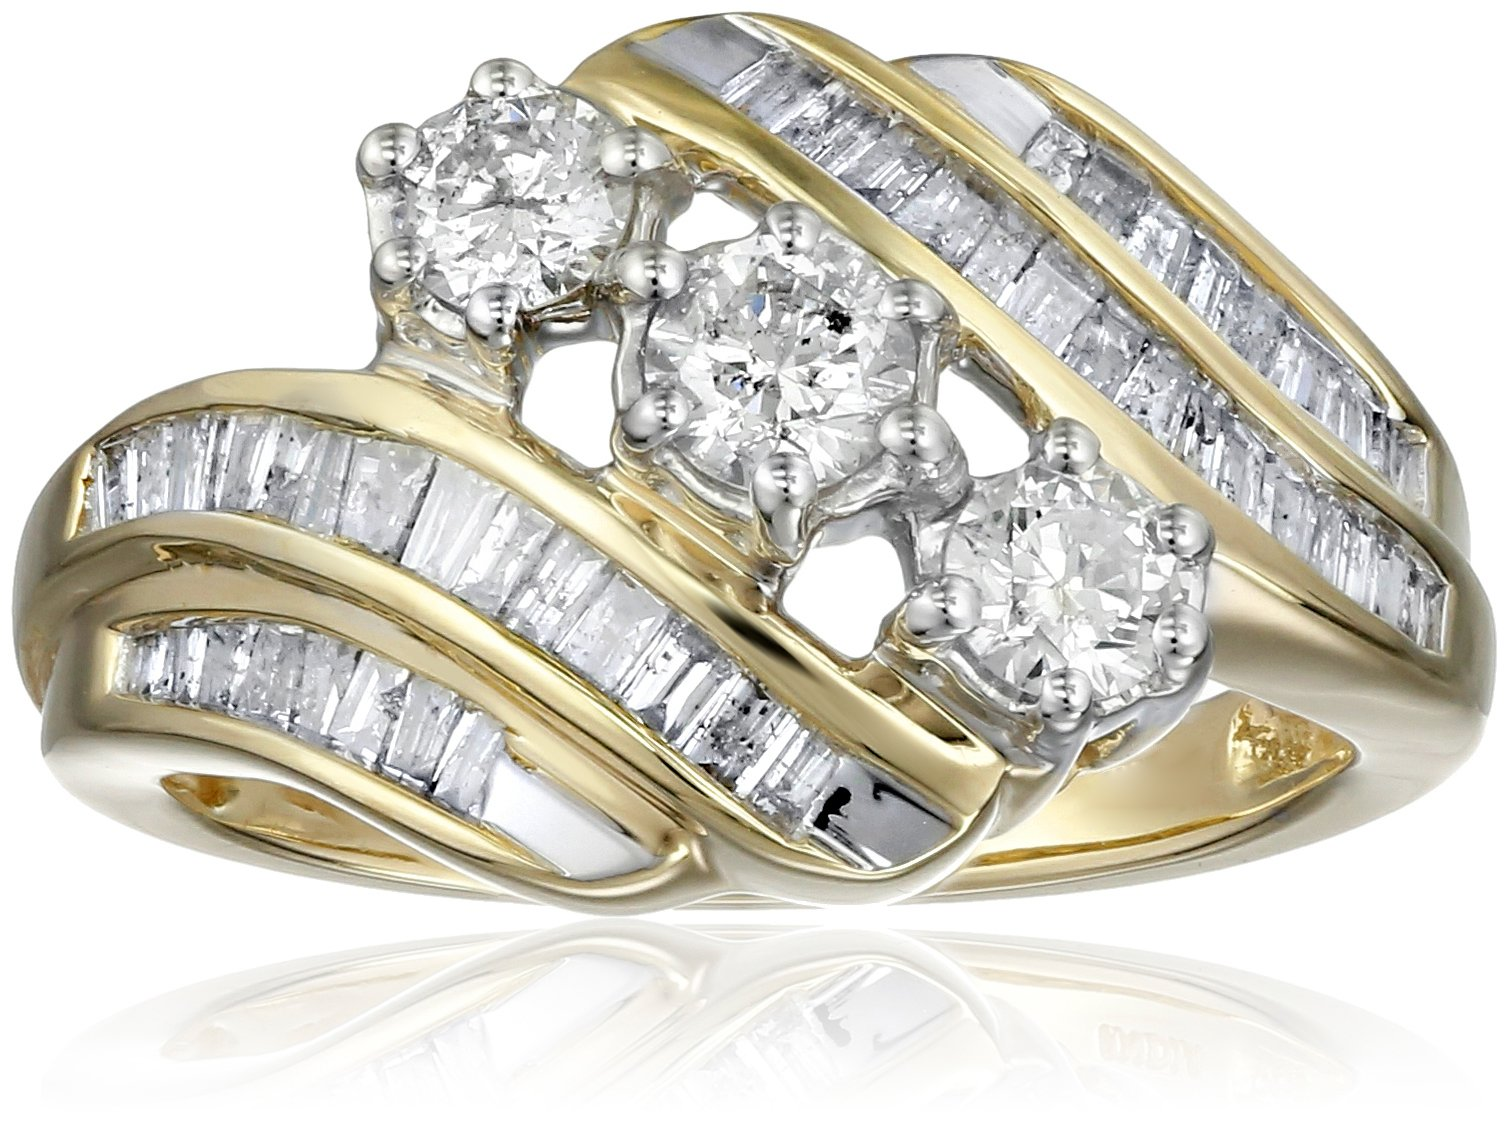 10K Yellow Gold Diamond 3 Stone Ring (1 cttw), Size 6